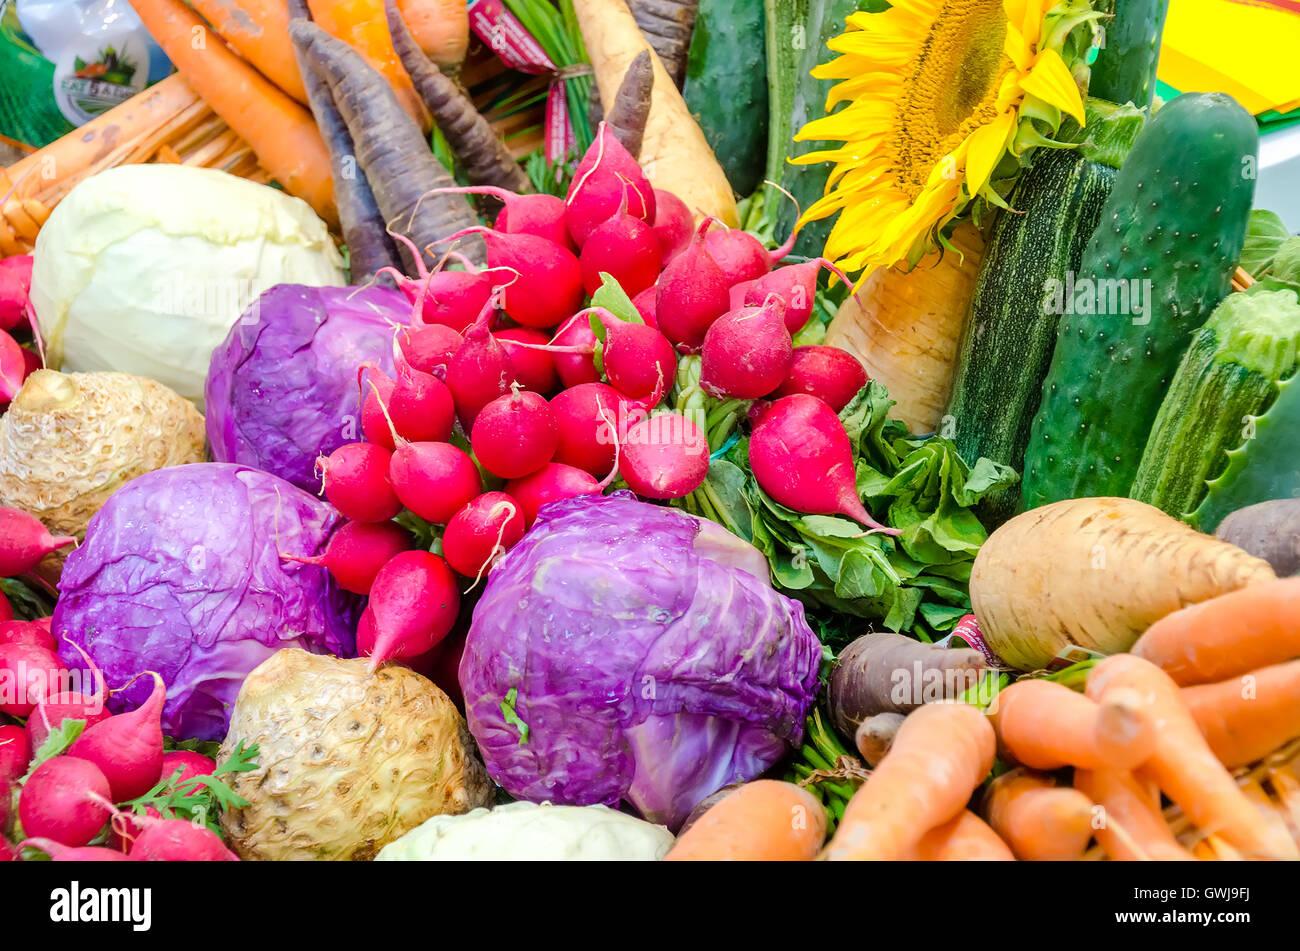 pink radish variety vegetables vegan background - Stock Image